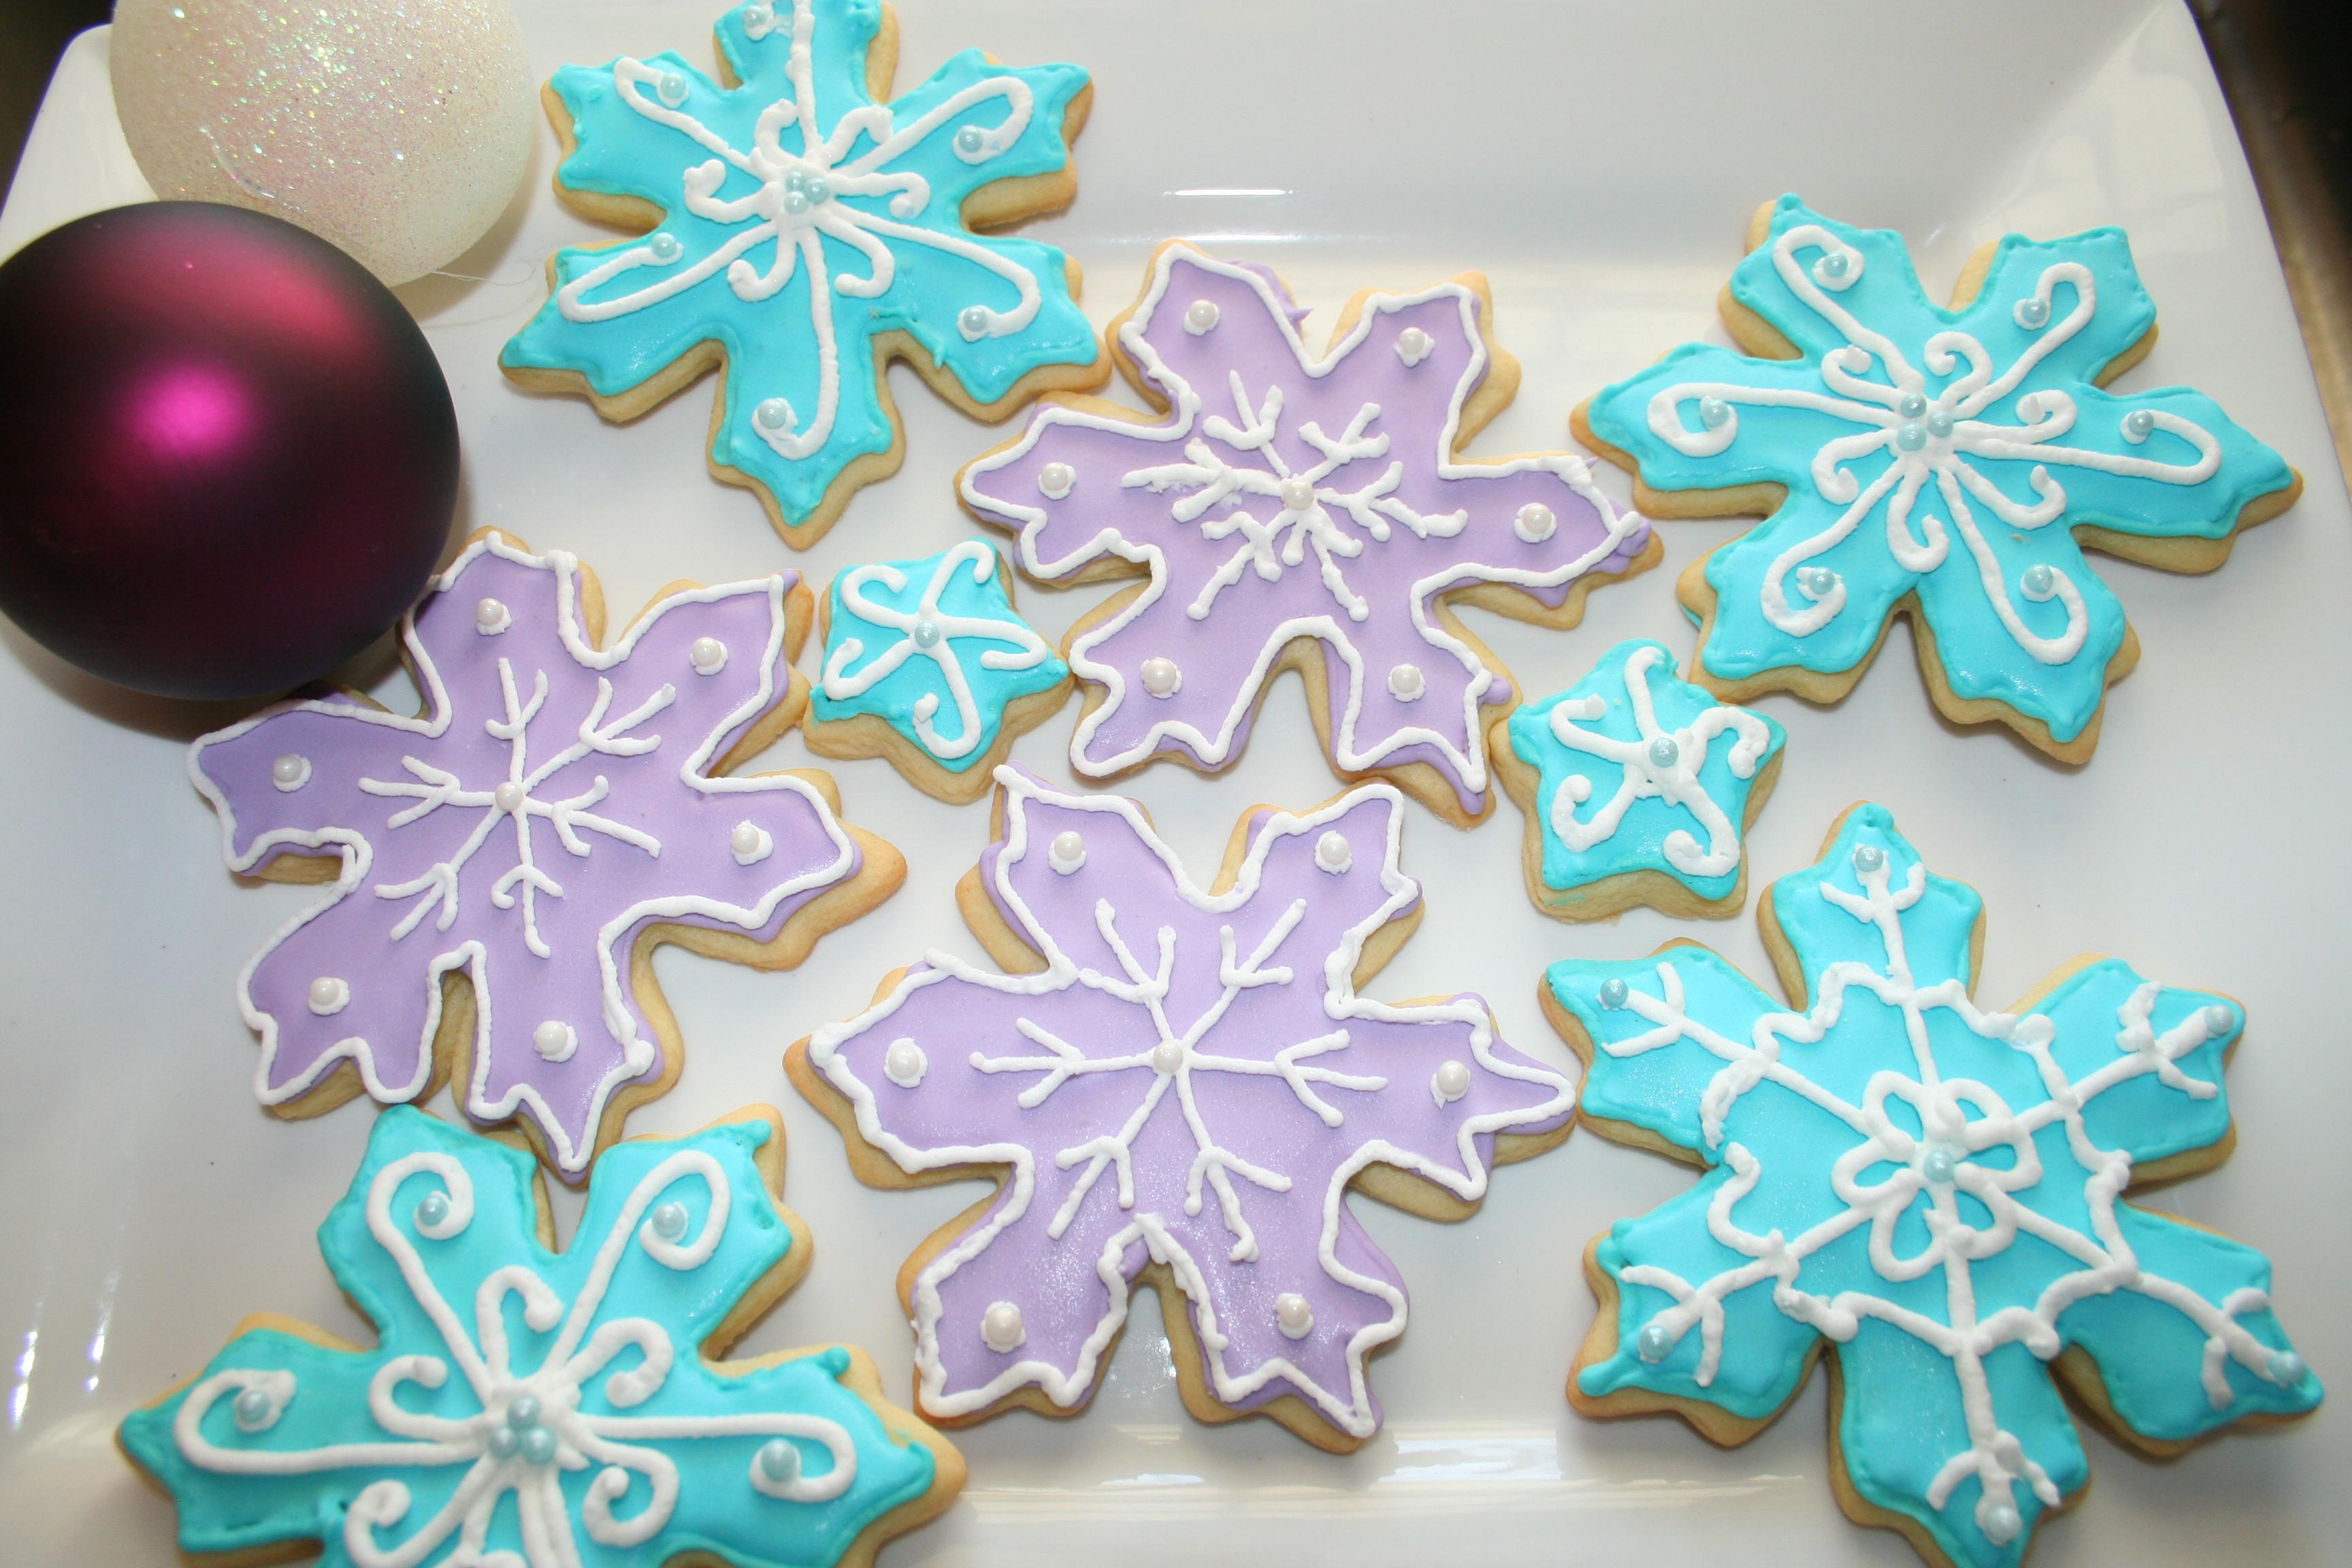 Decorated Christmas Sugar Cookies  Ultimate Sugar Cookies – Decorated for Christmas